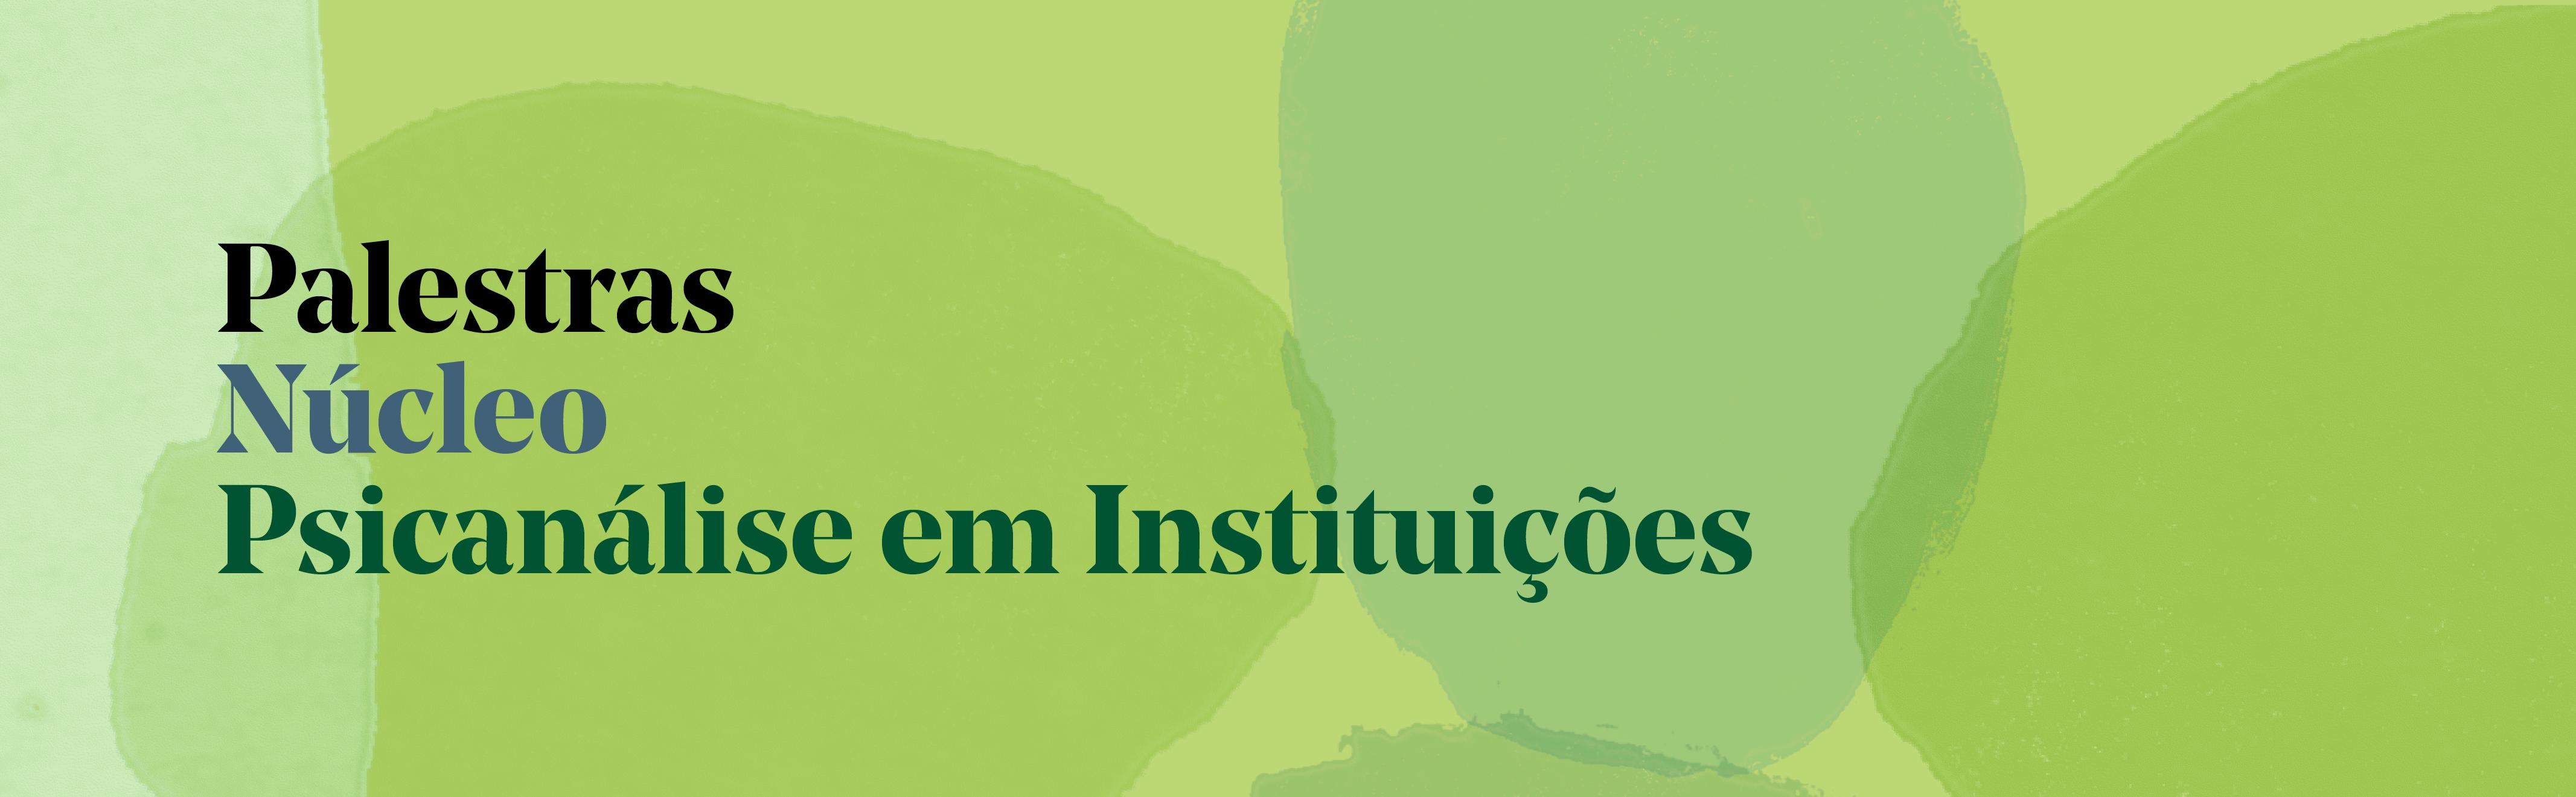 Palestras Núcleo Psicanálise em Instituições